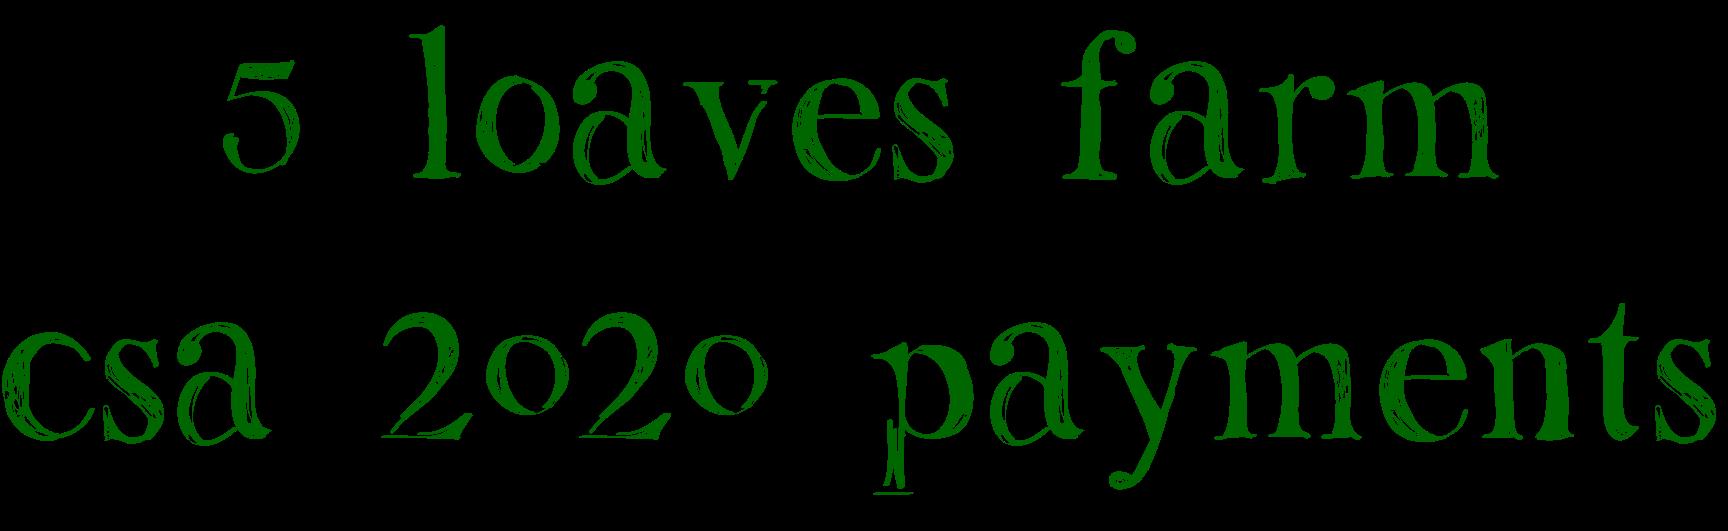 5 loaves farm csa 2020 payments